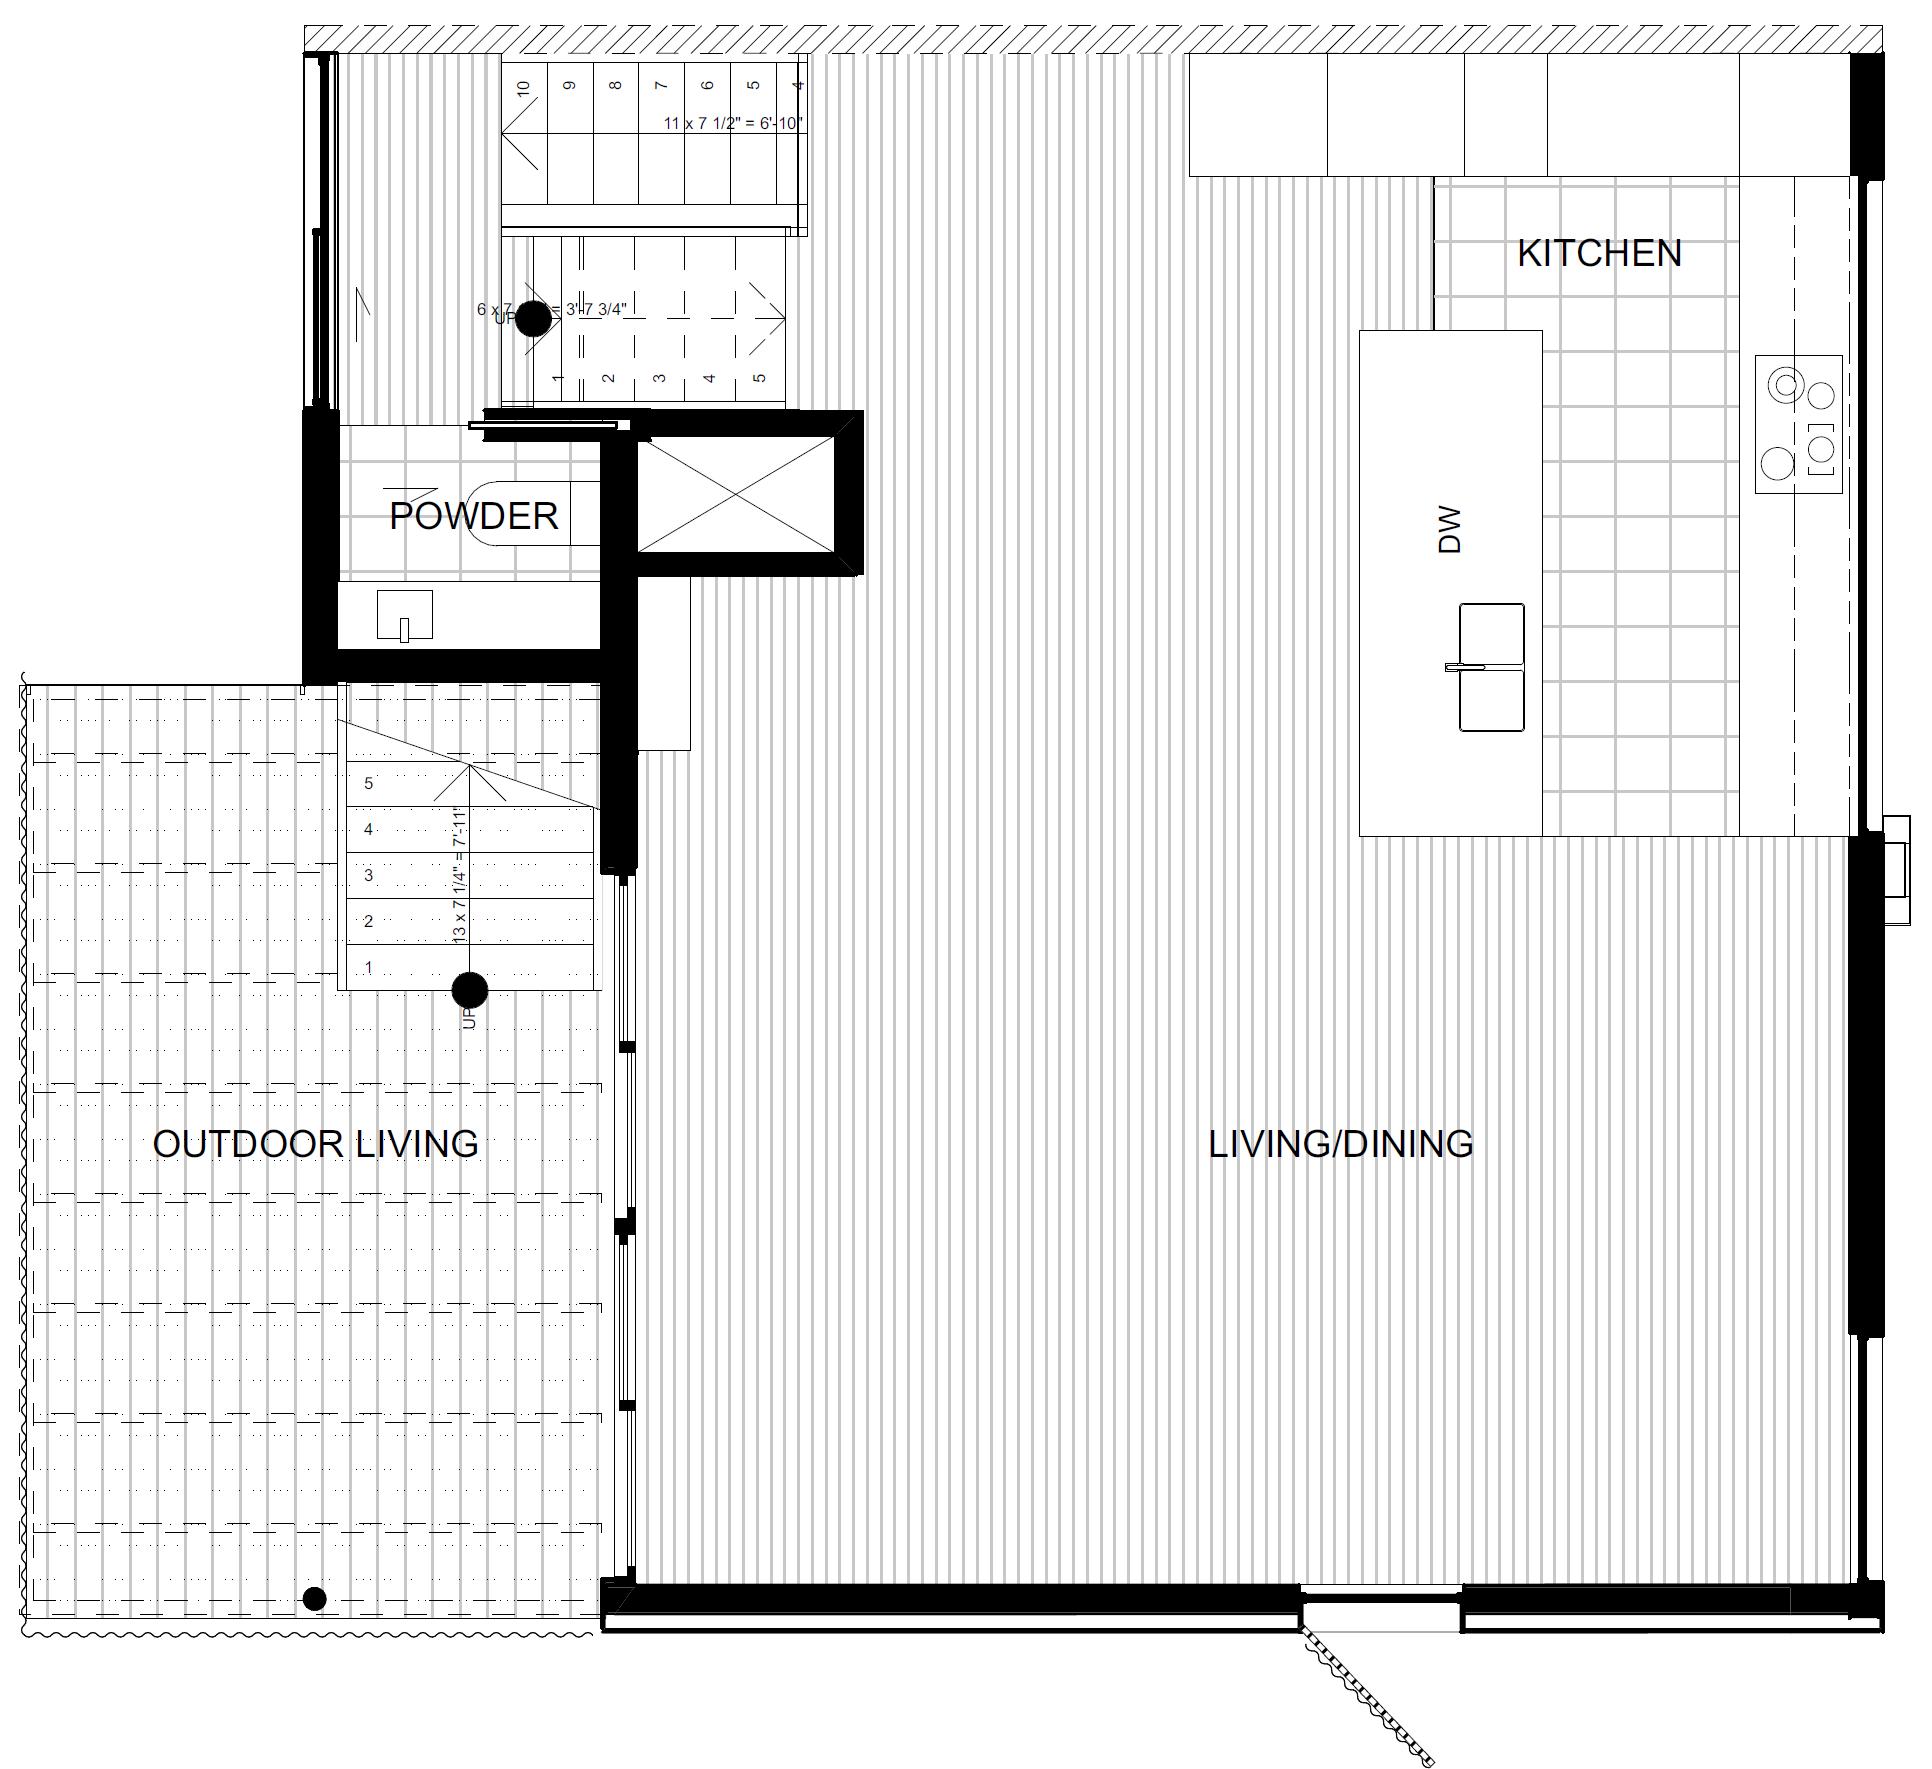 Third Floor - Kitchen and Living